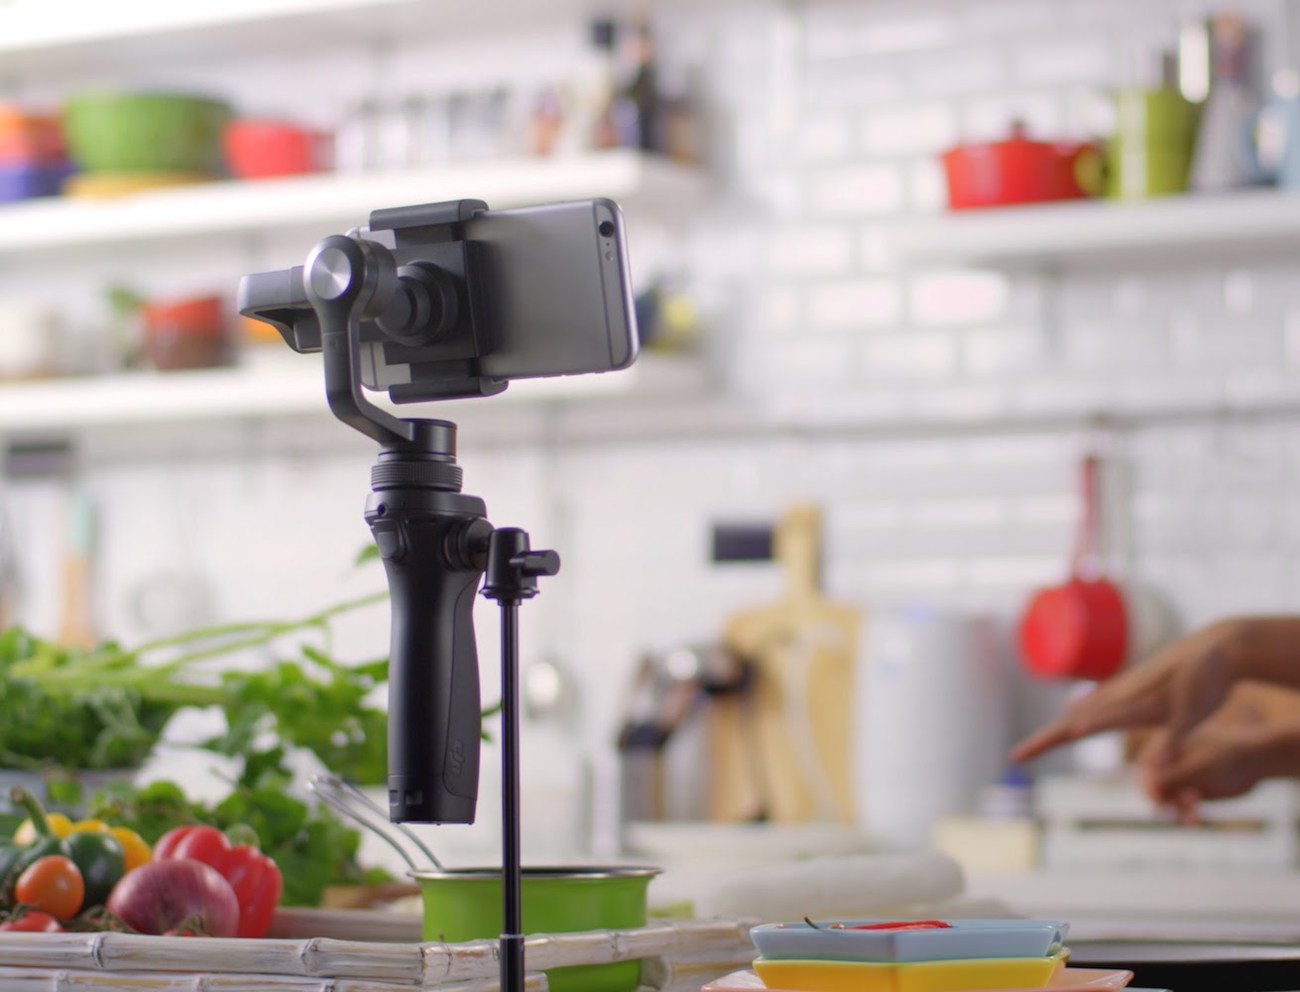 DJI Osmo Mobile Motion Camera Setup